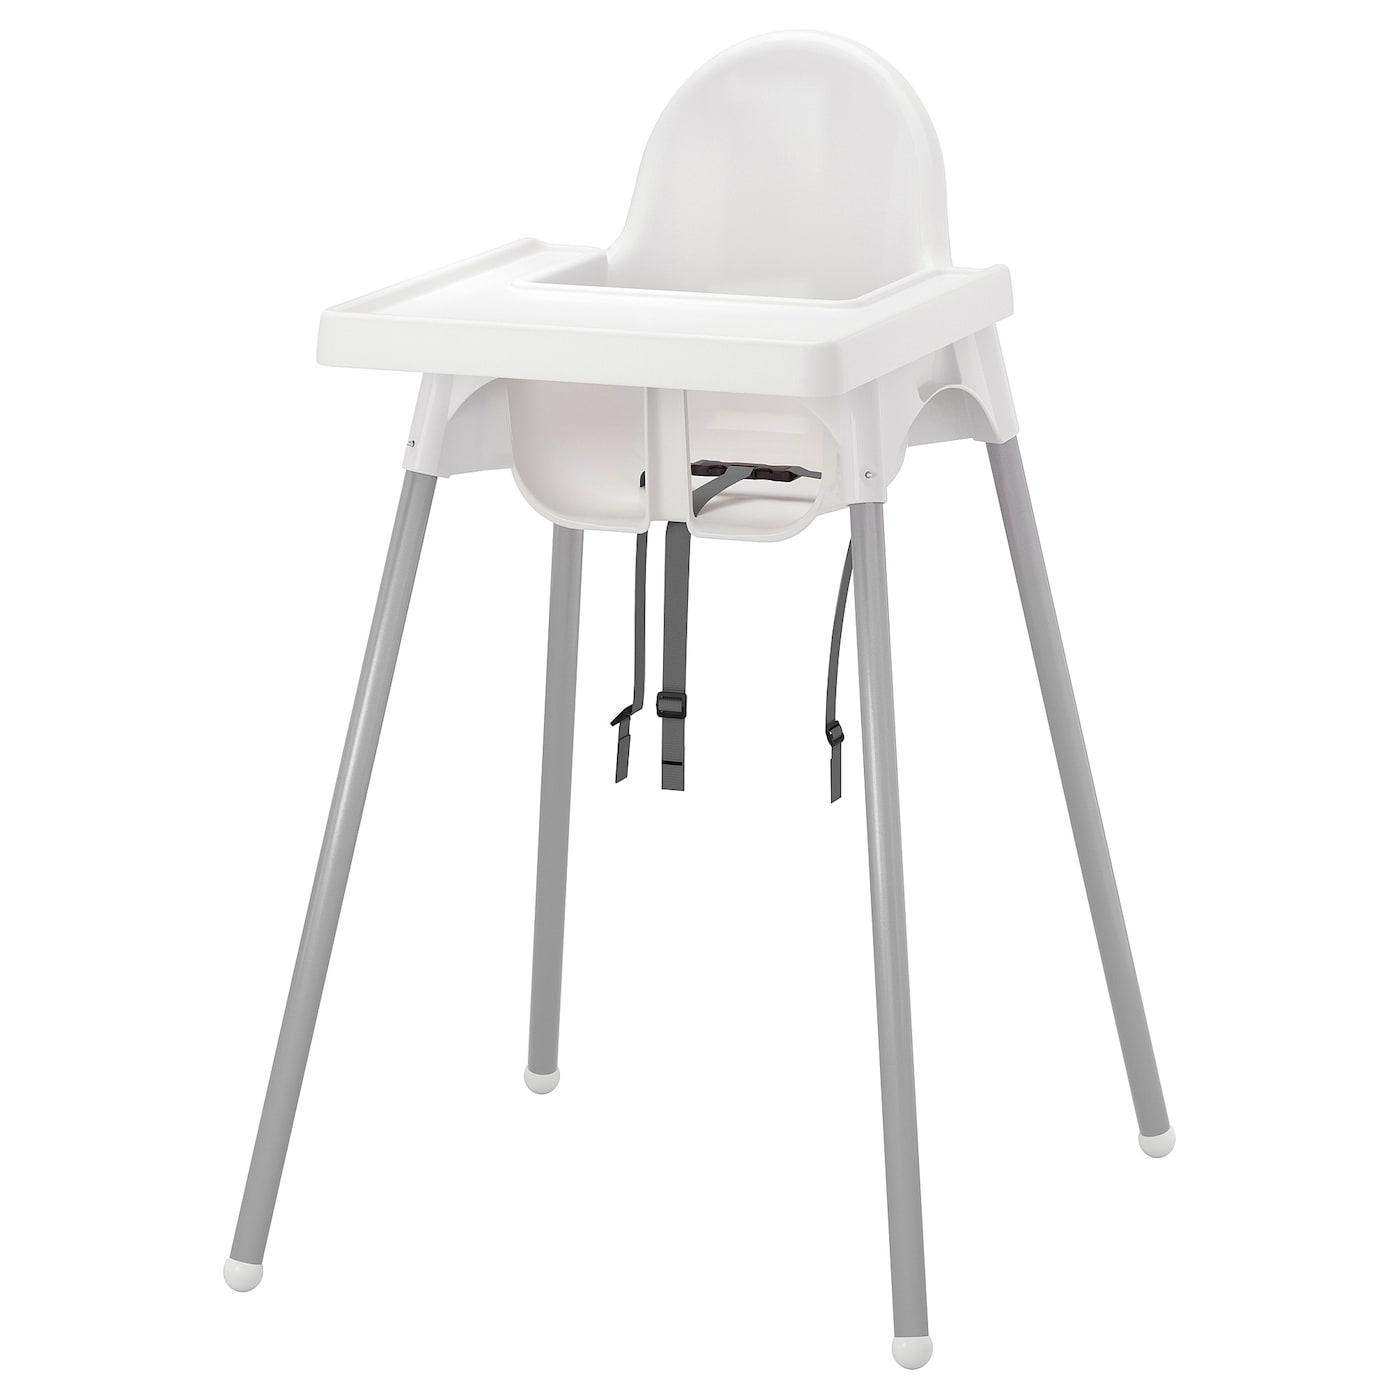 IKEA LANGUR Sitzbezug//Polster gelb f.Hochstuhl Kinderhochstuhl Babystuhl Antilop